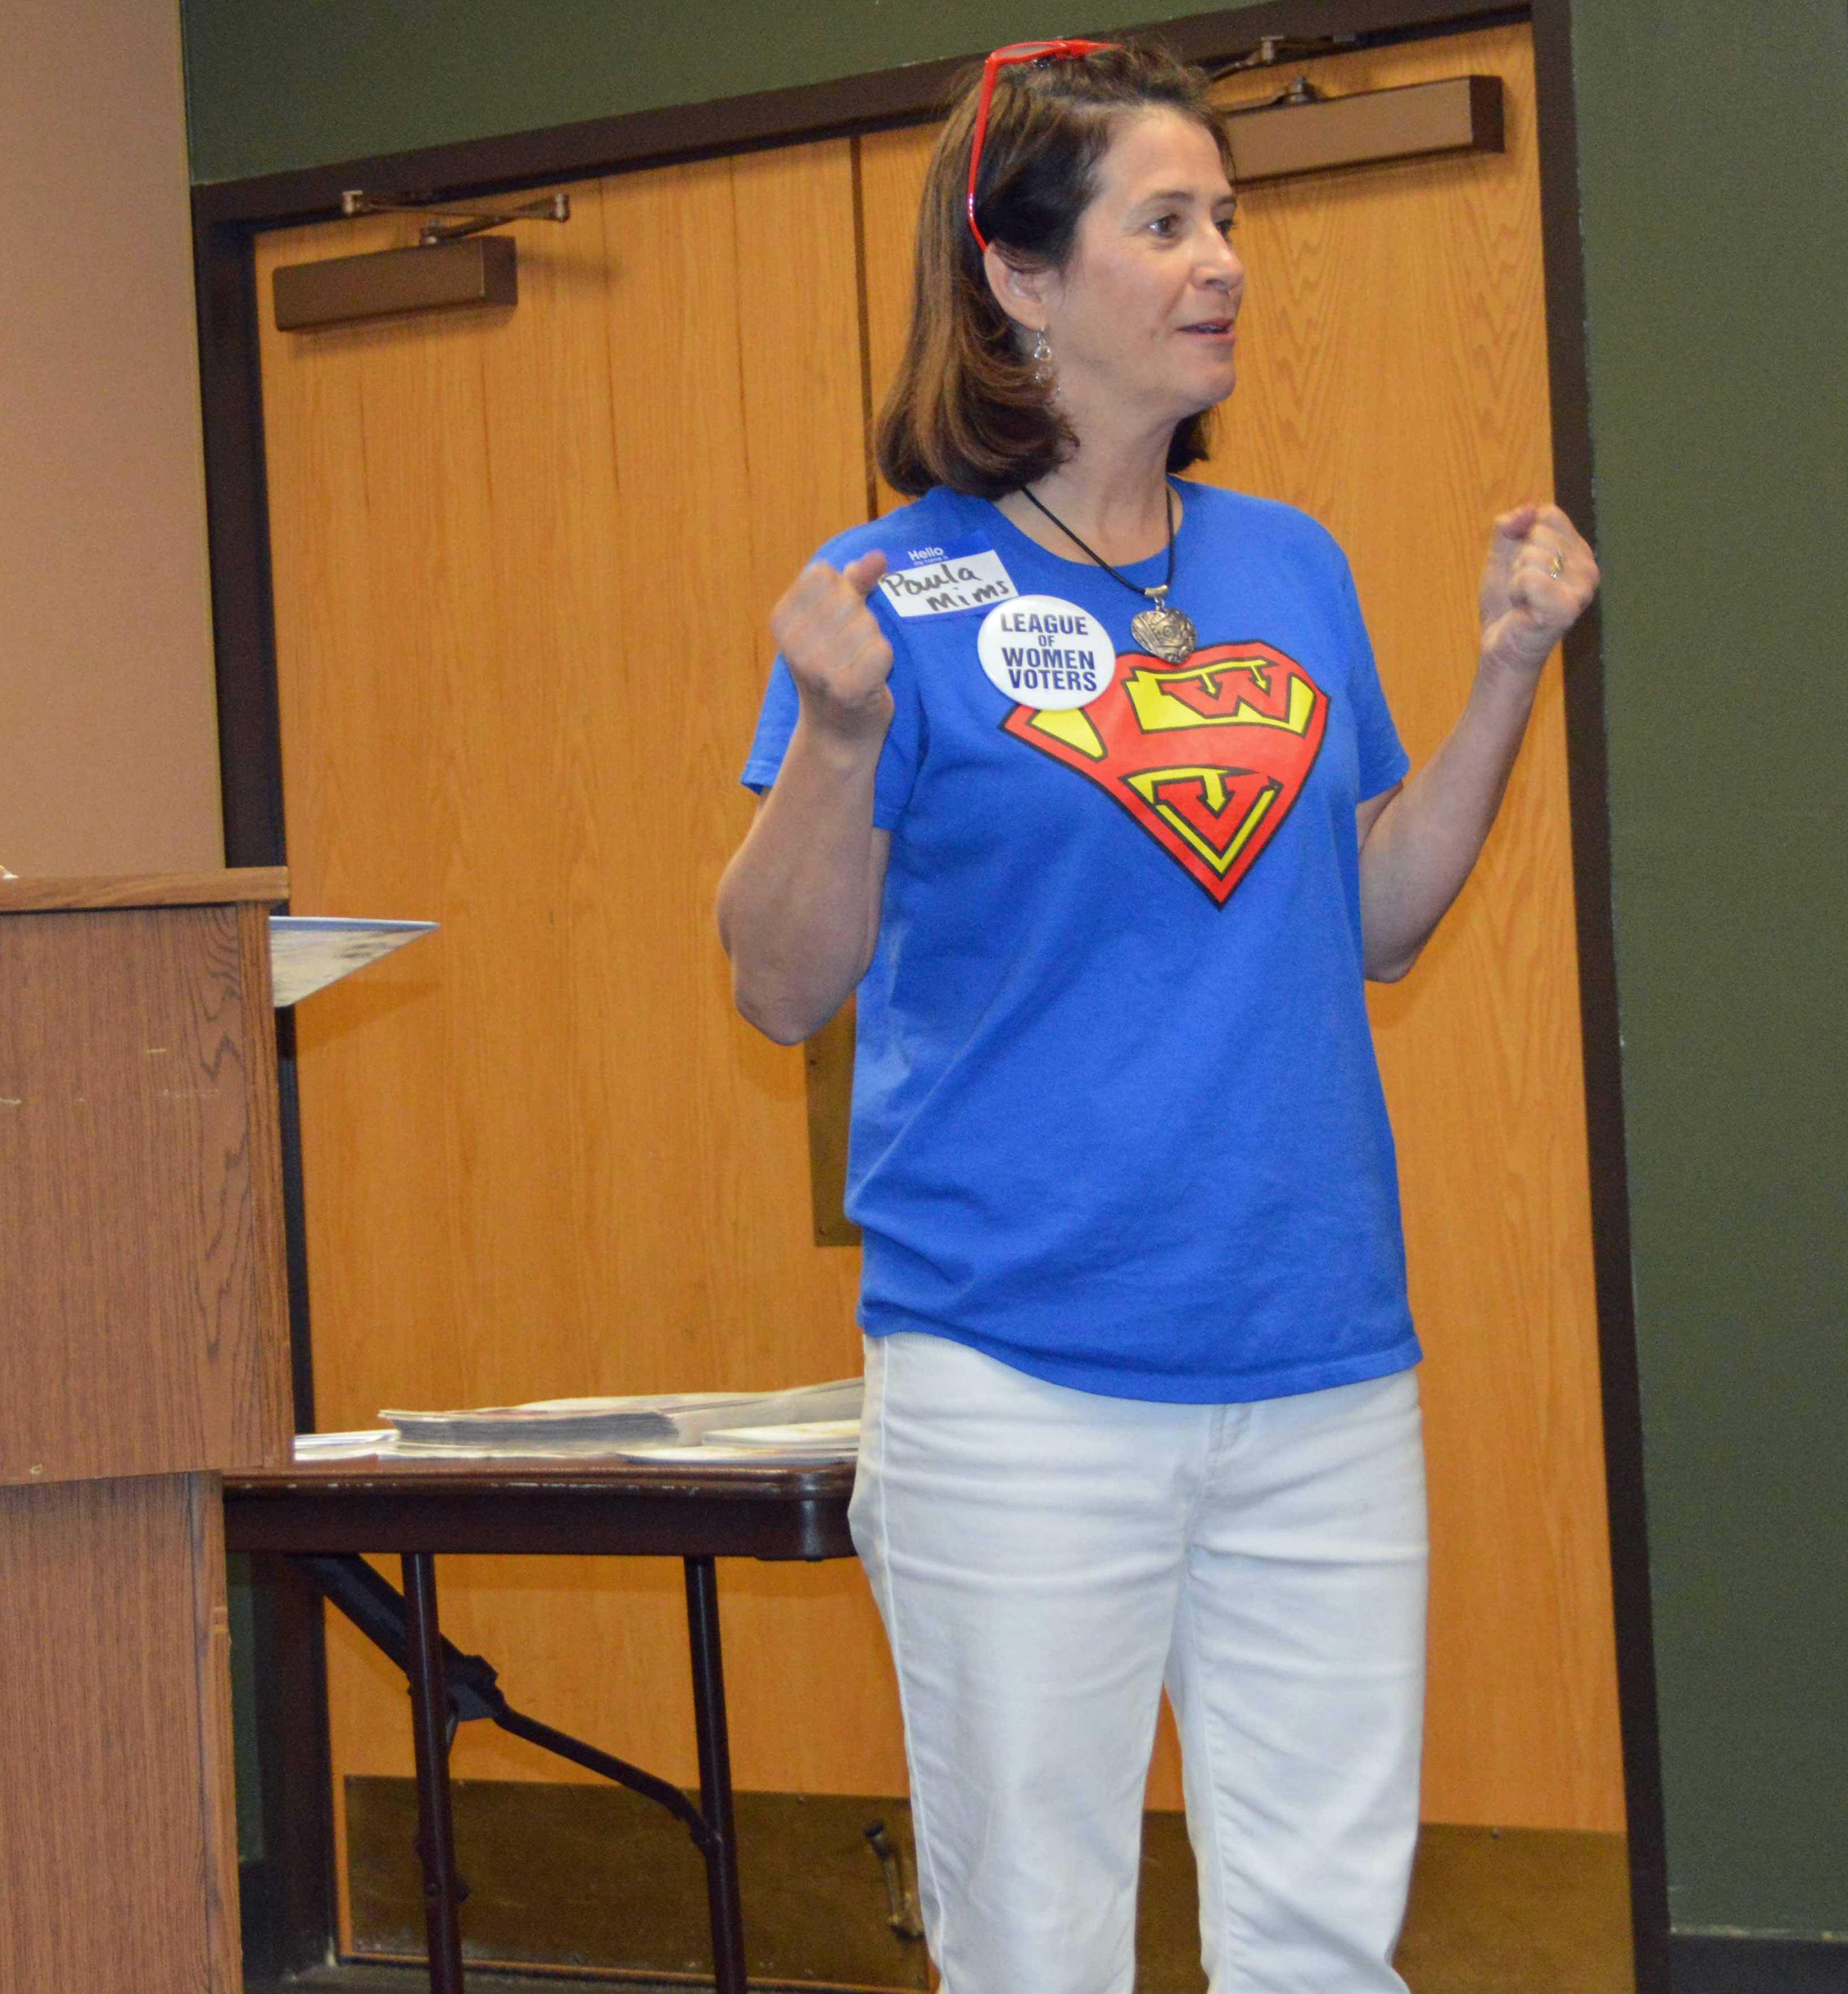 Paula presenting